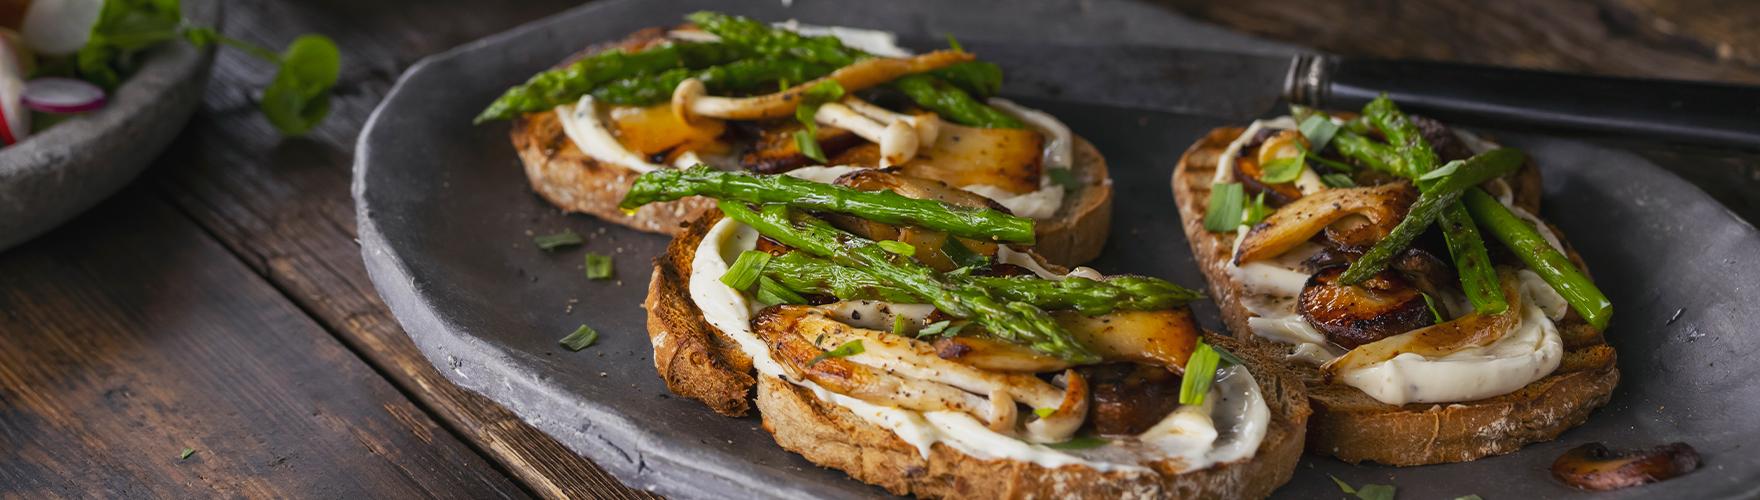 Desem toast met gebakken paddenstoelen, asperges en truffelkaas